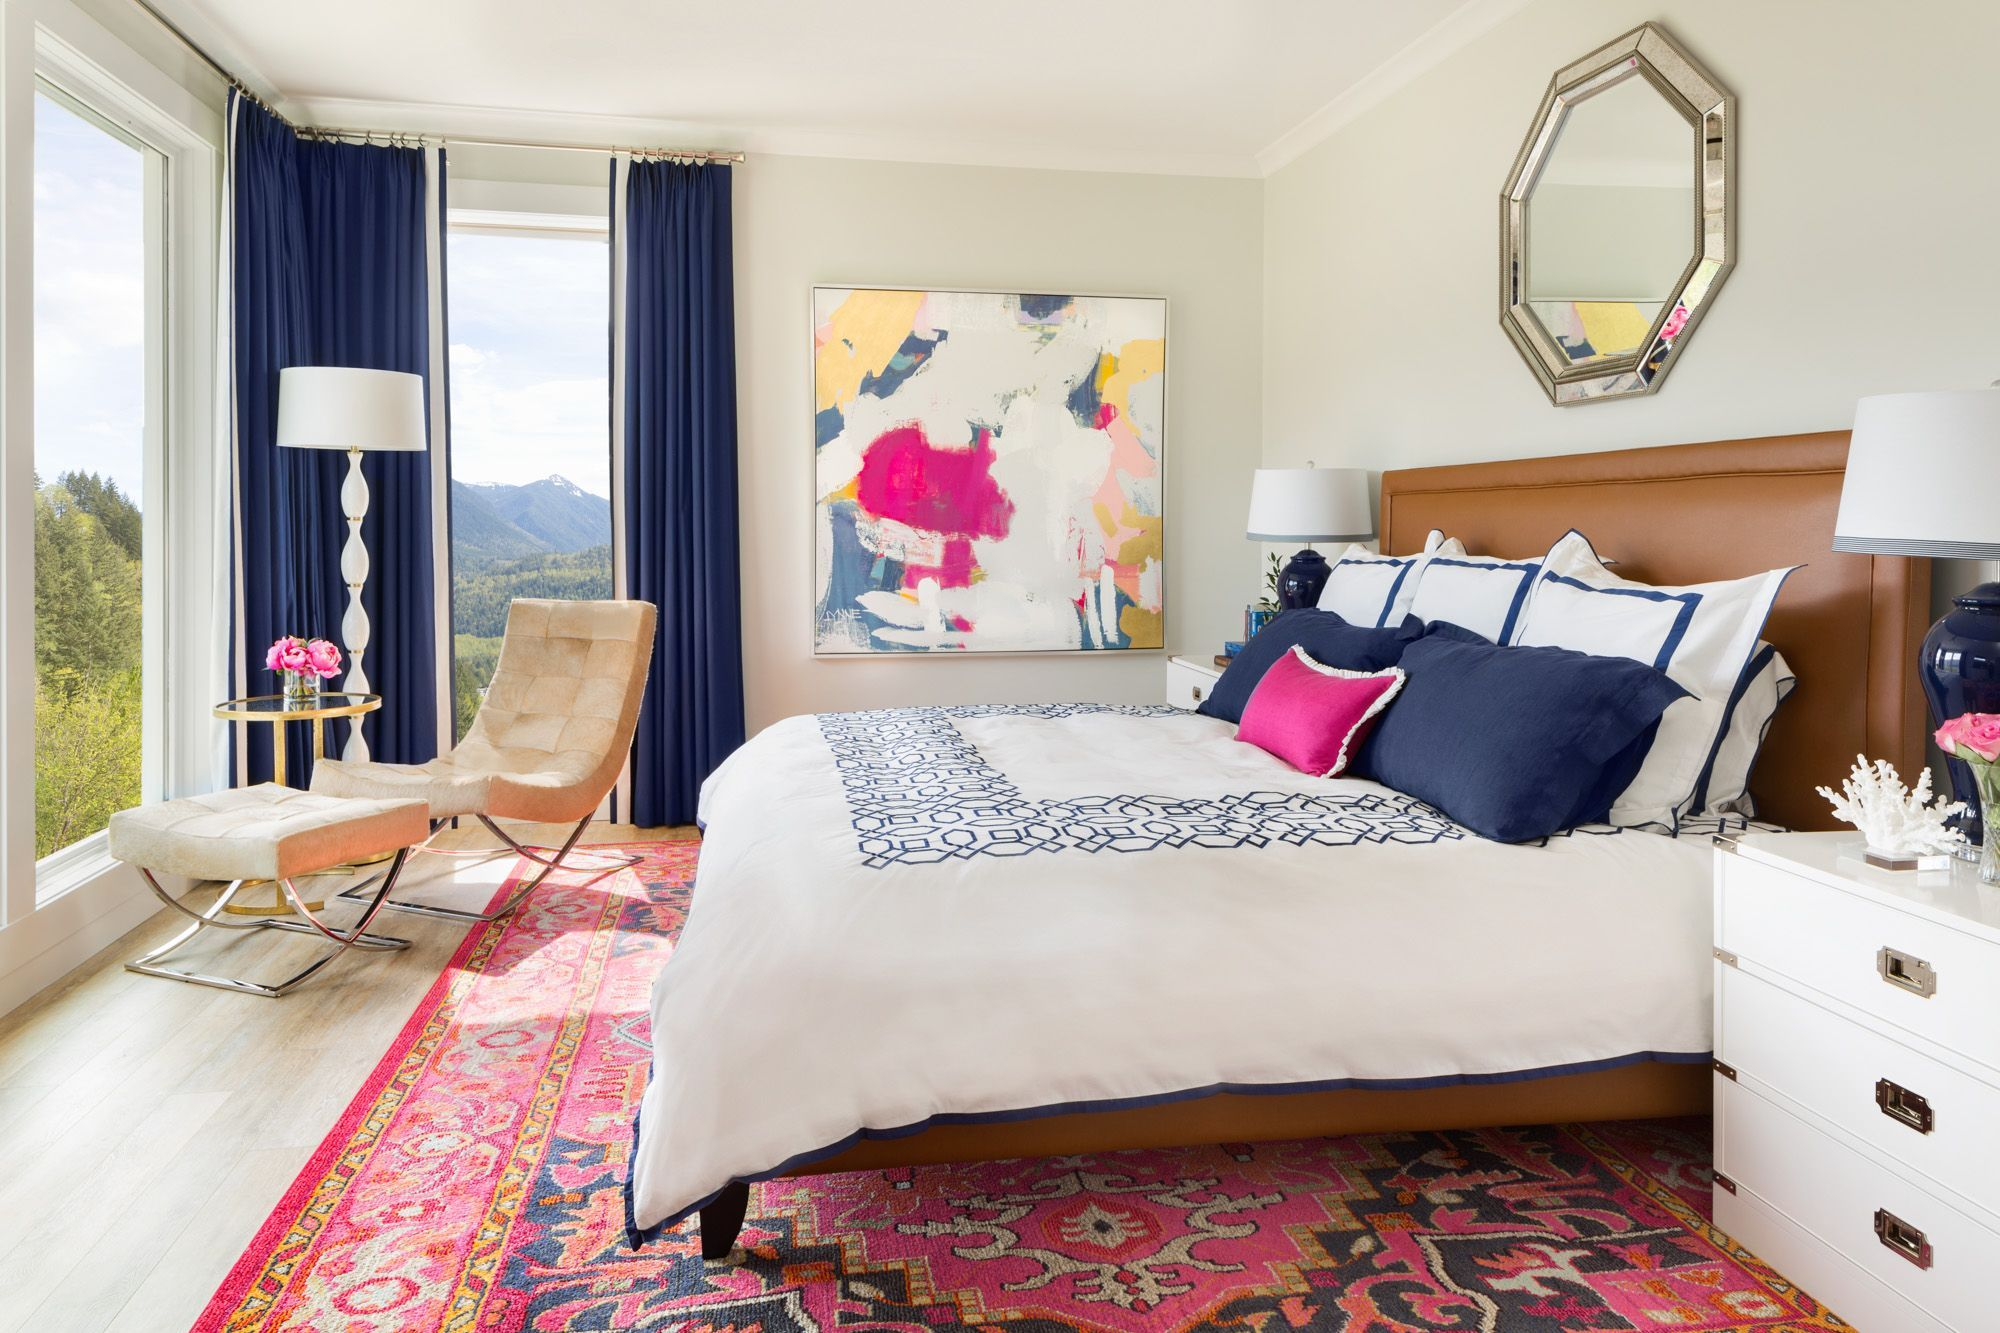 Master bedroom ensuite  Pink and Navy Master Bedroom  Ensuite Before u After  Interior